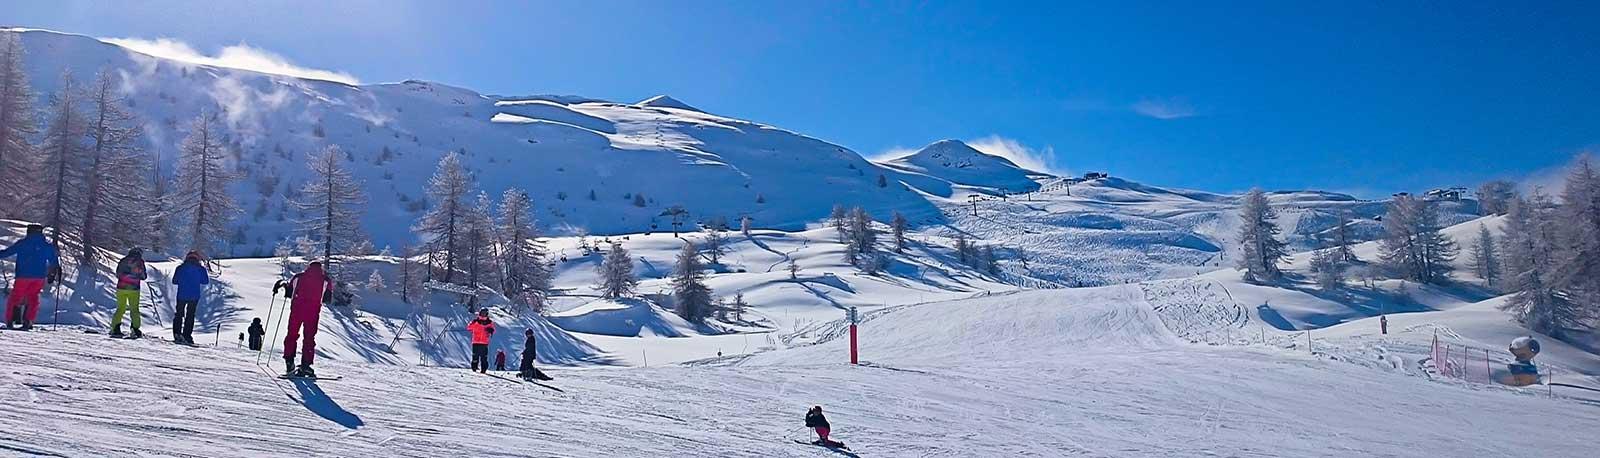 Sauze d'Oulx School Ski Trips